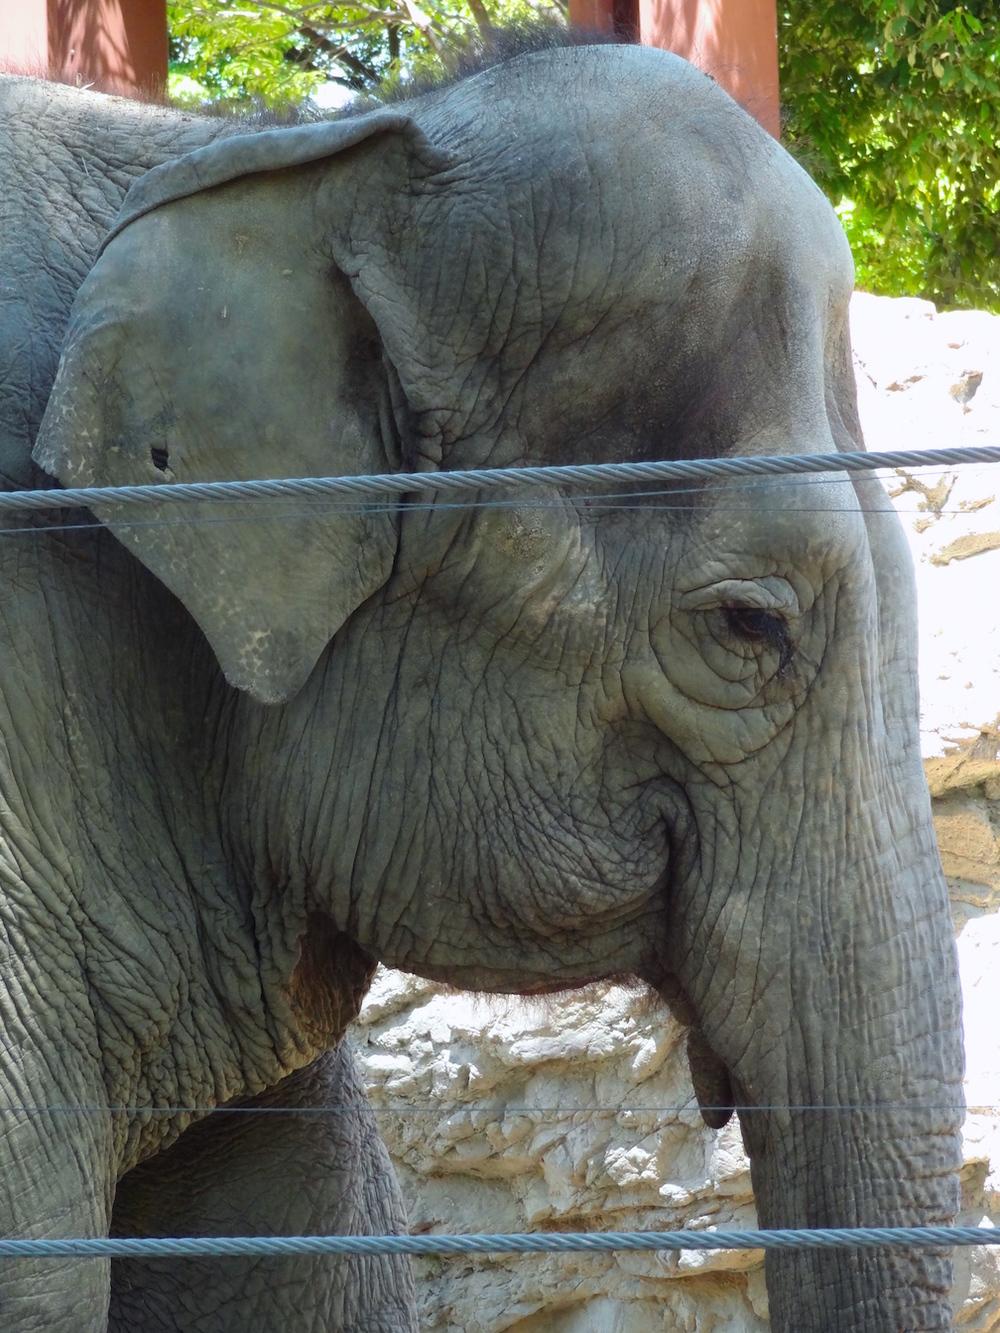 P8 Ueno Zoo Elephant 2 small.jpeg